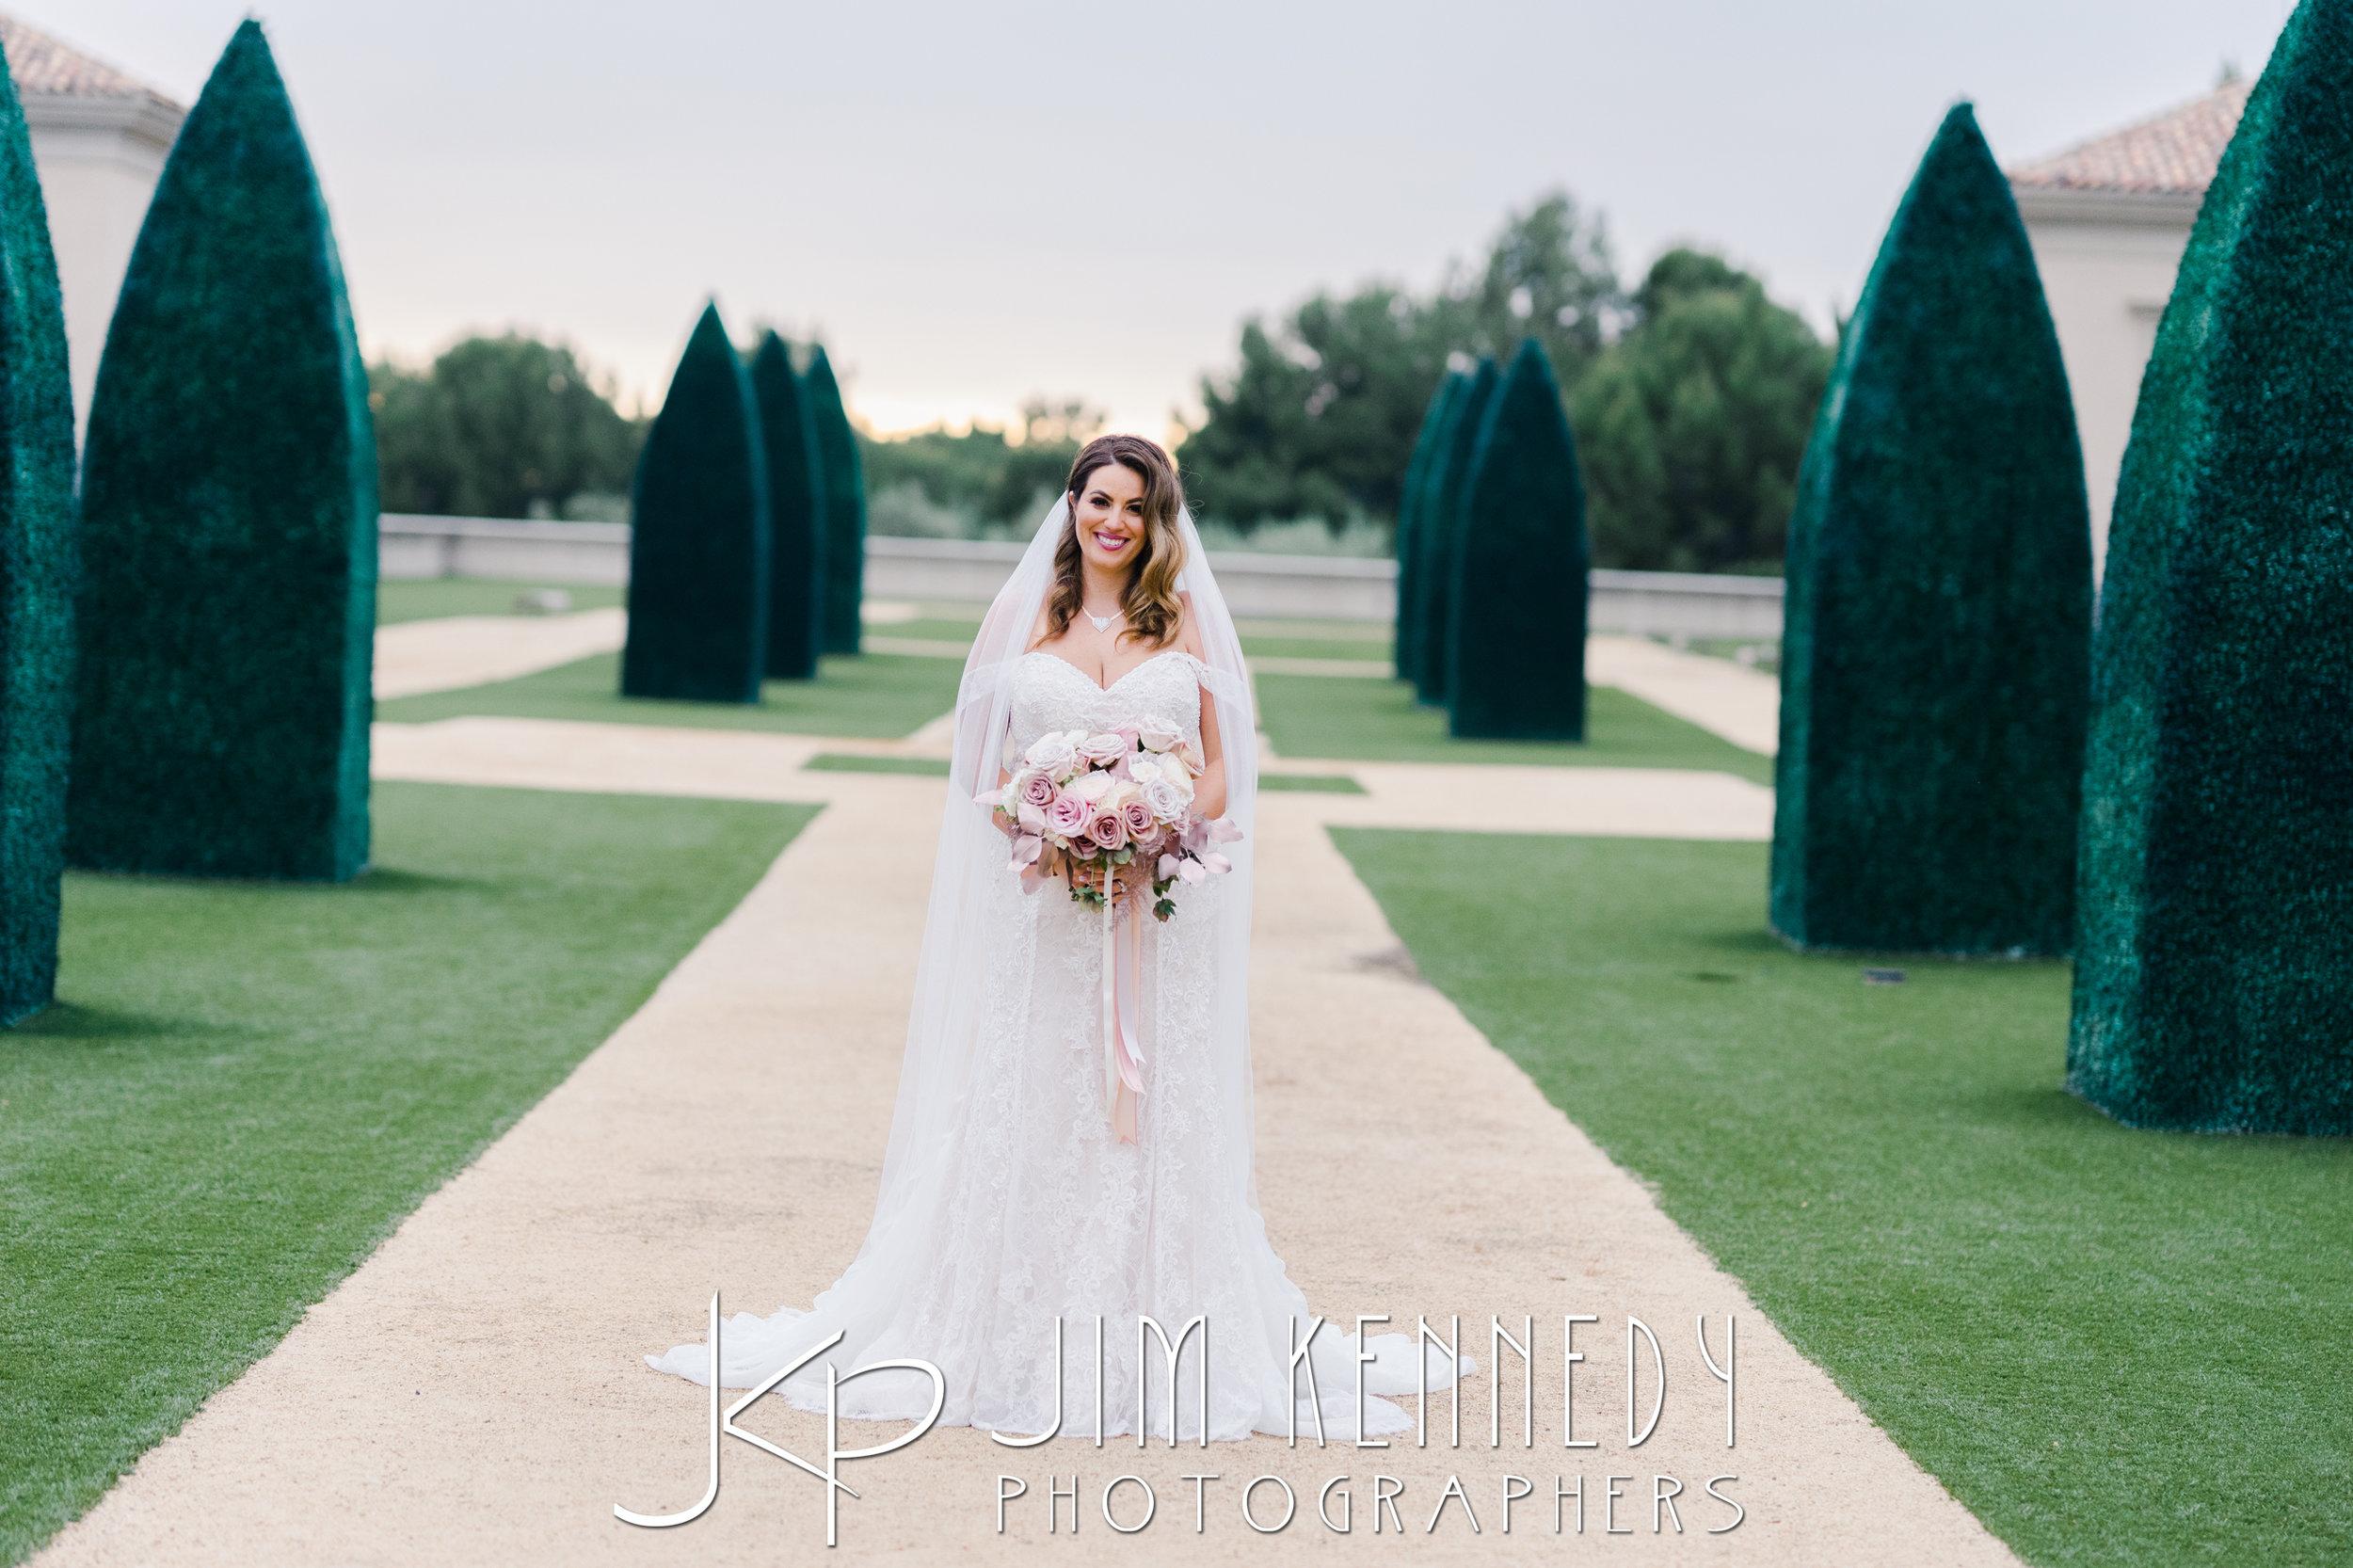 pelican-hill-wedding-jim-kenedy-photographers_0168.JPG